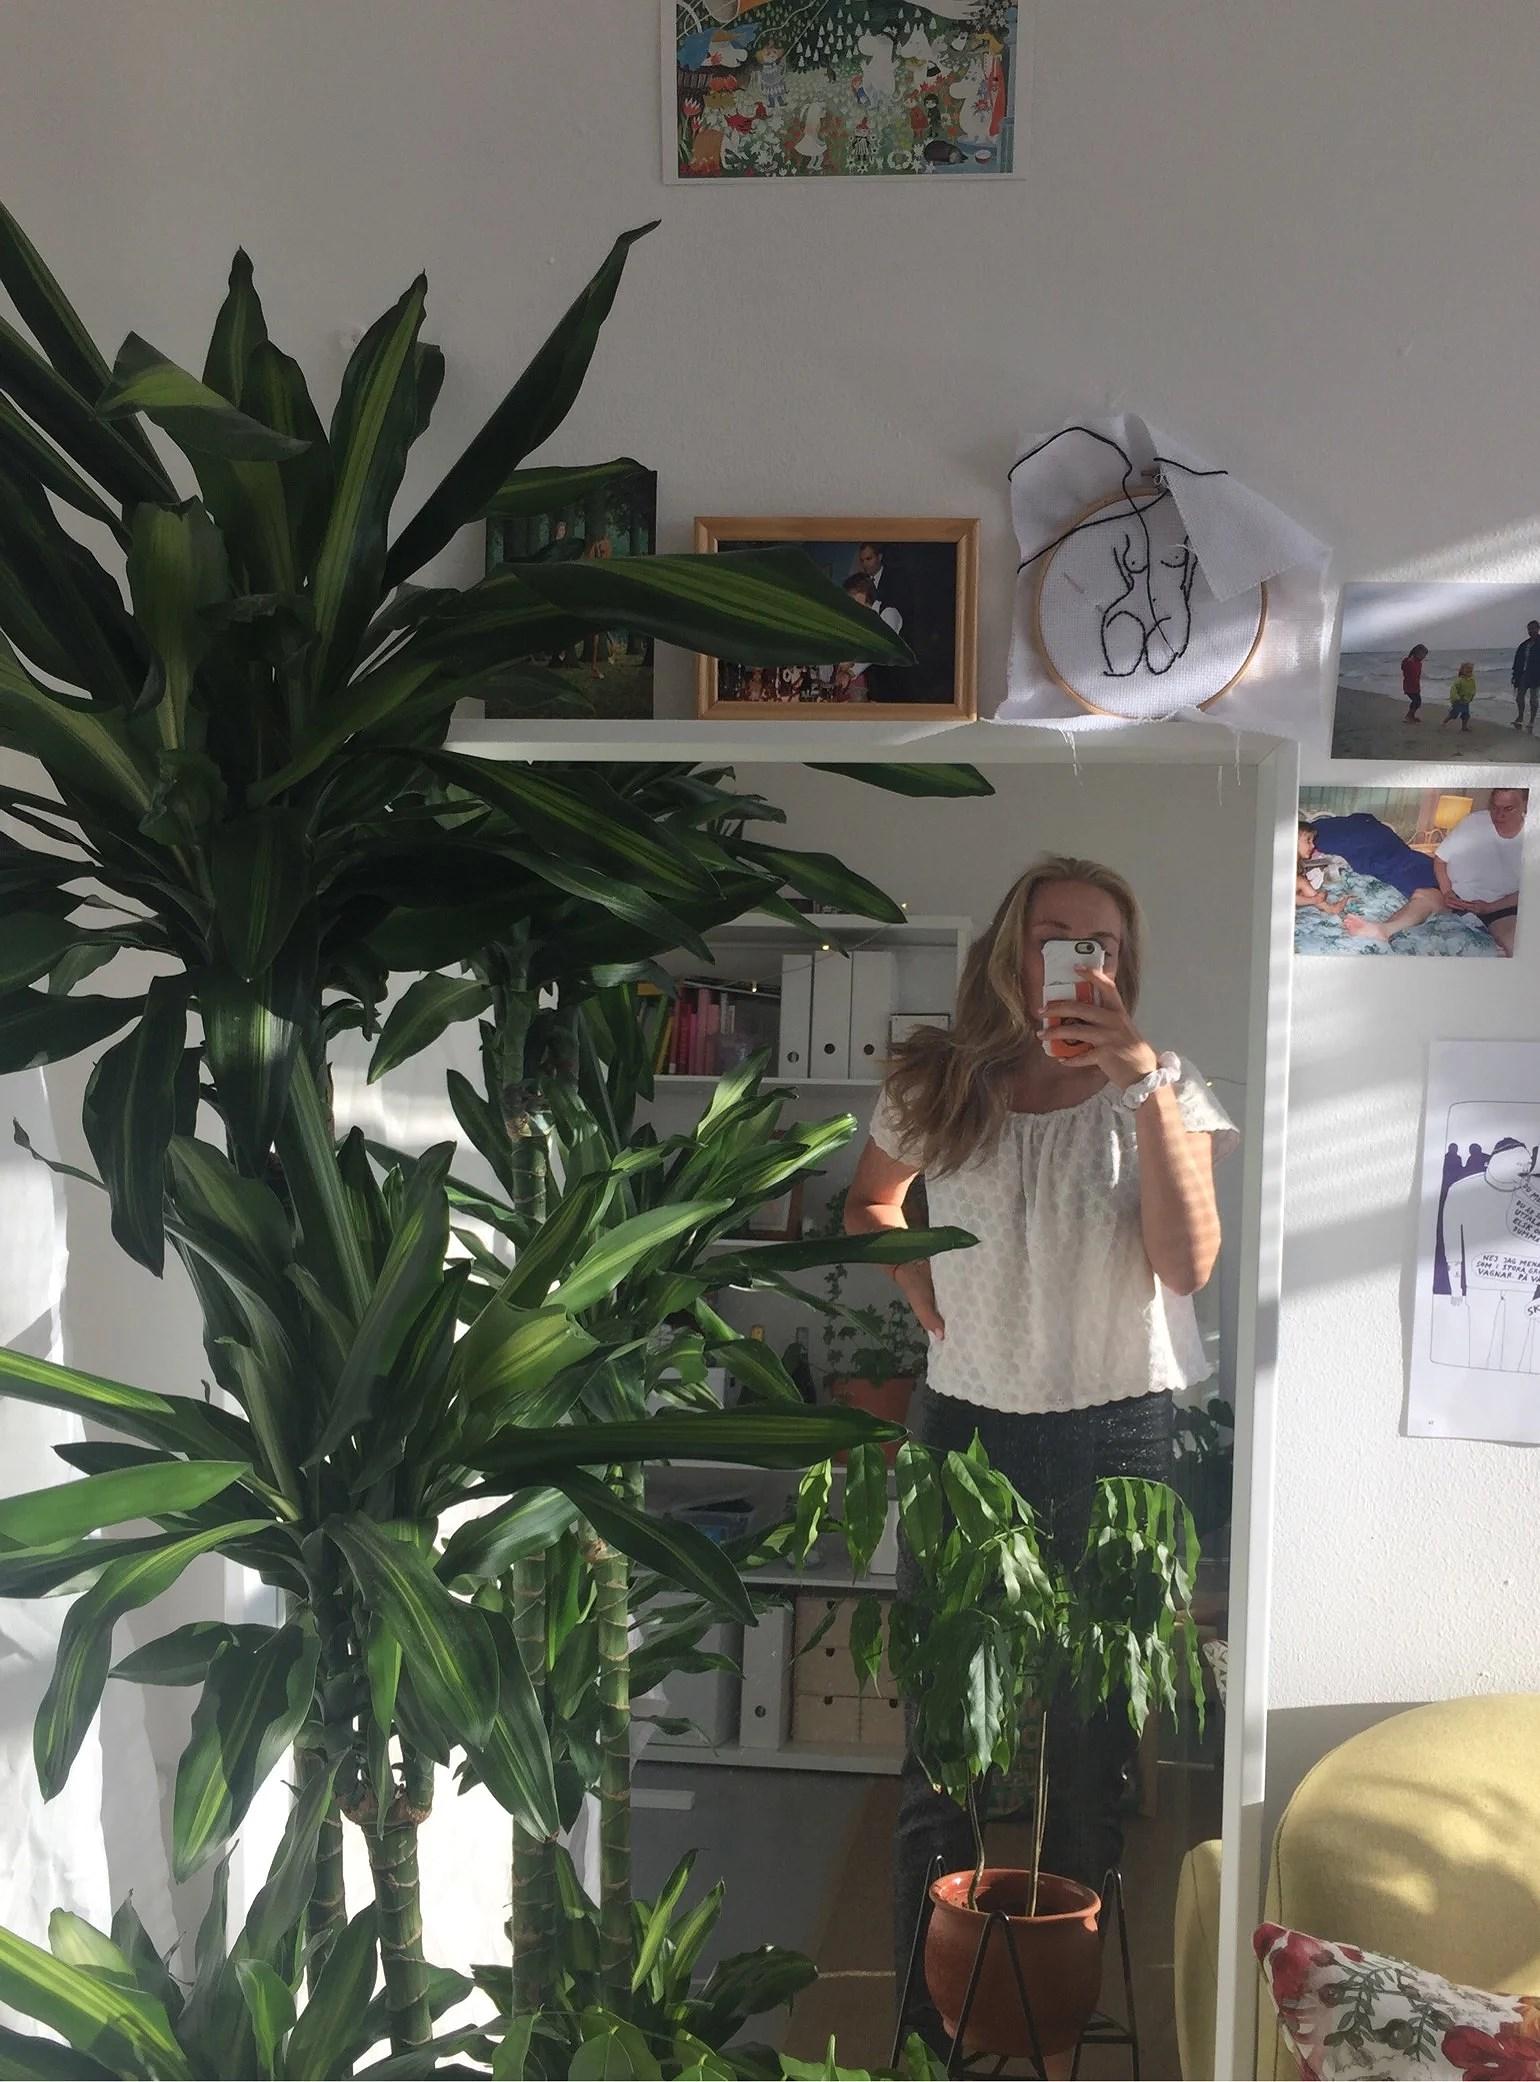 Rebecka's Student Room